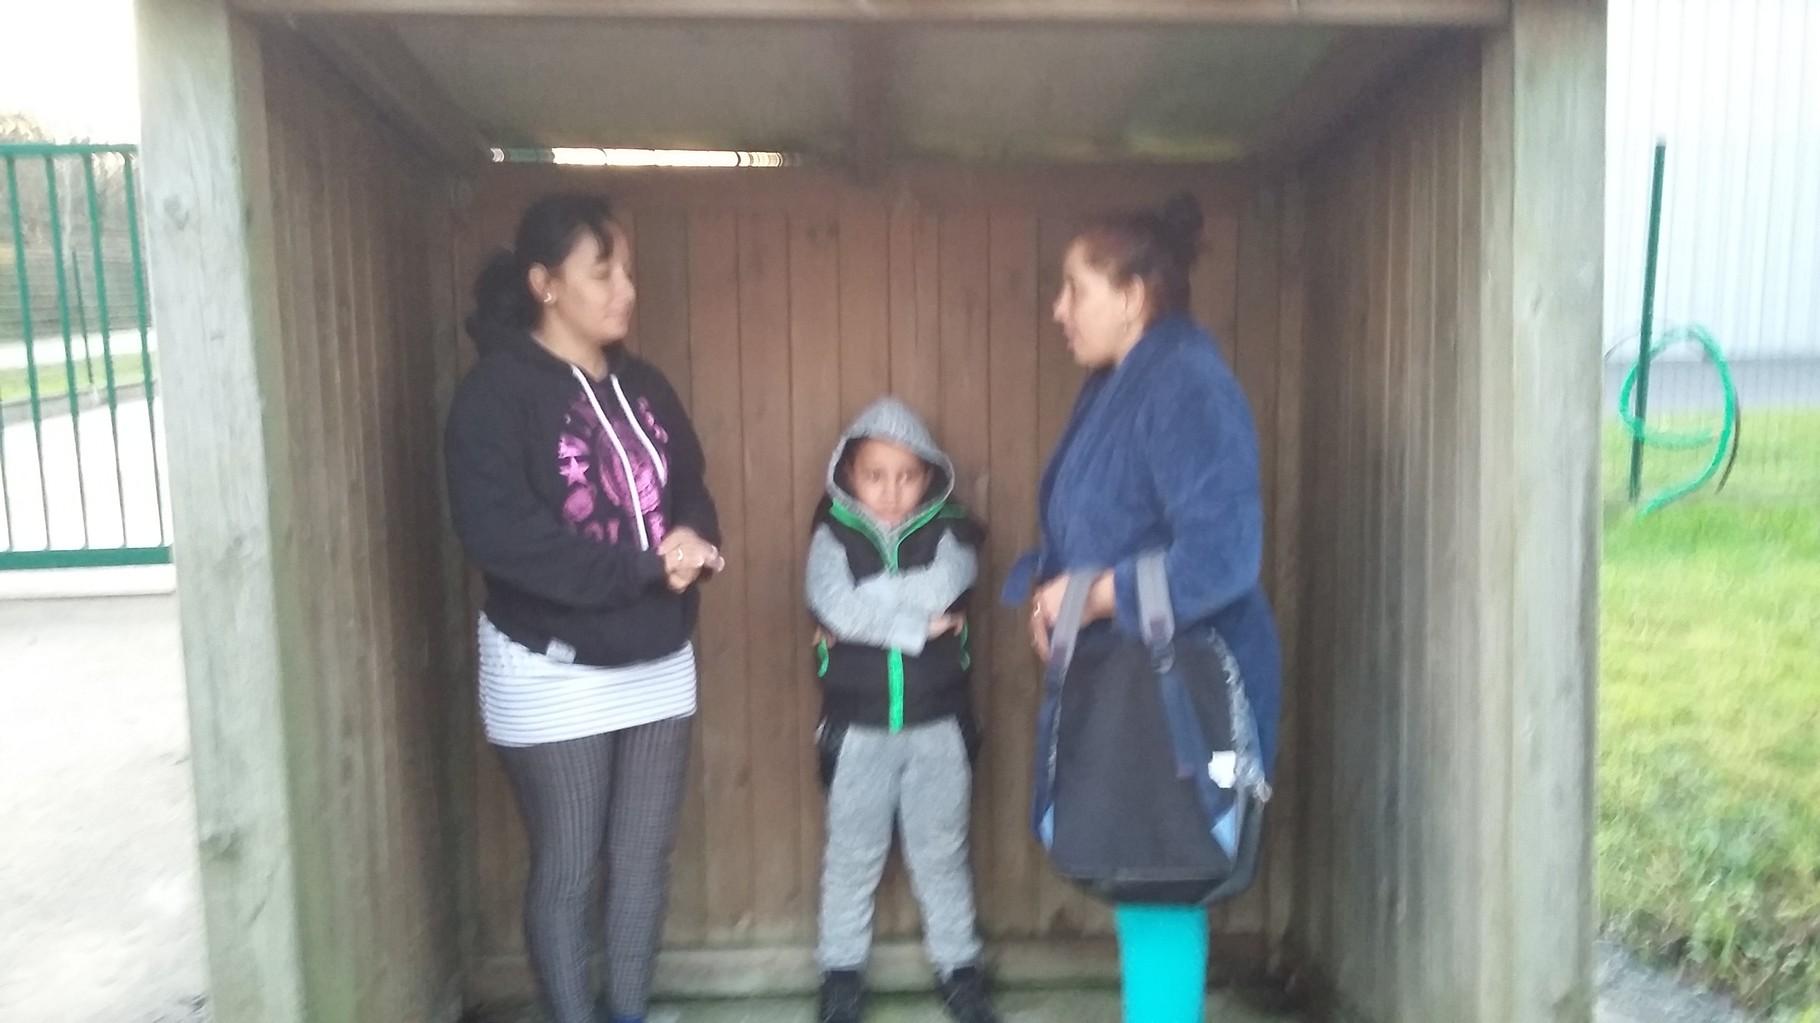 Alexandru avec Mariana, sa grand-mère, et Alina